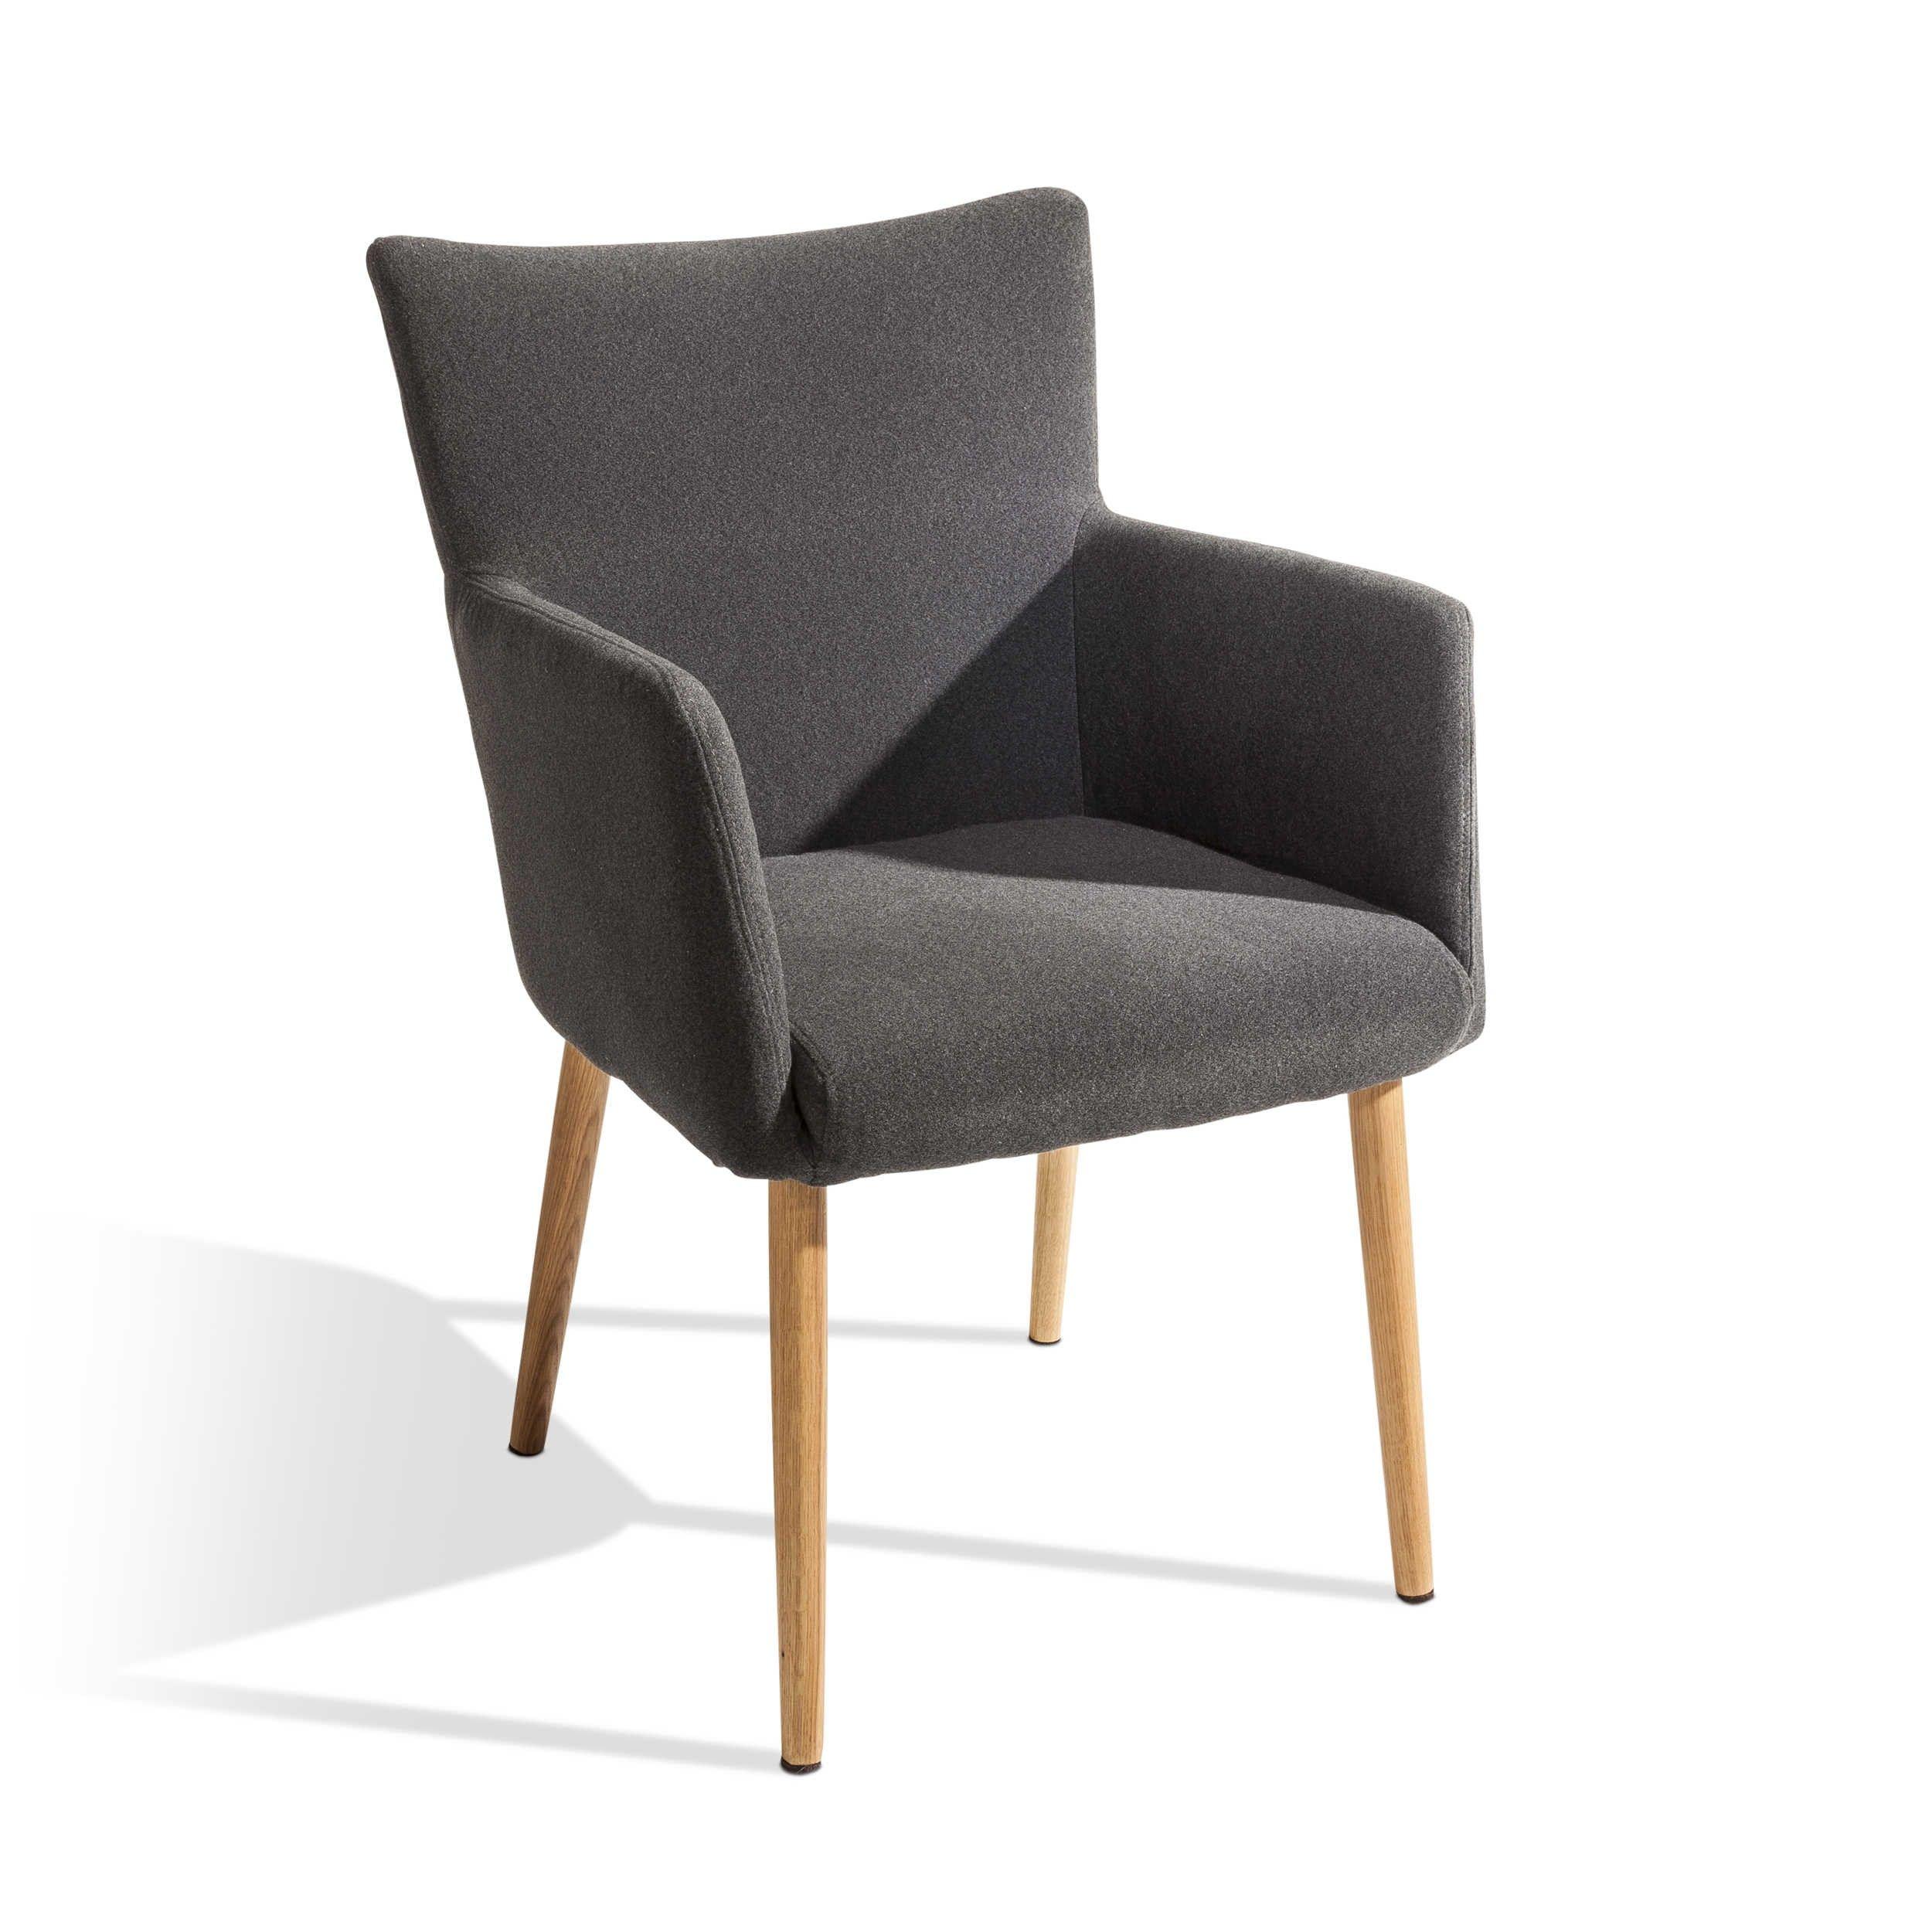 Stuhl Lamole Grau Stoff Online Kaufen Bei Woonio Stuhle Stuhle Gunstig Mobel